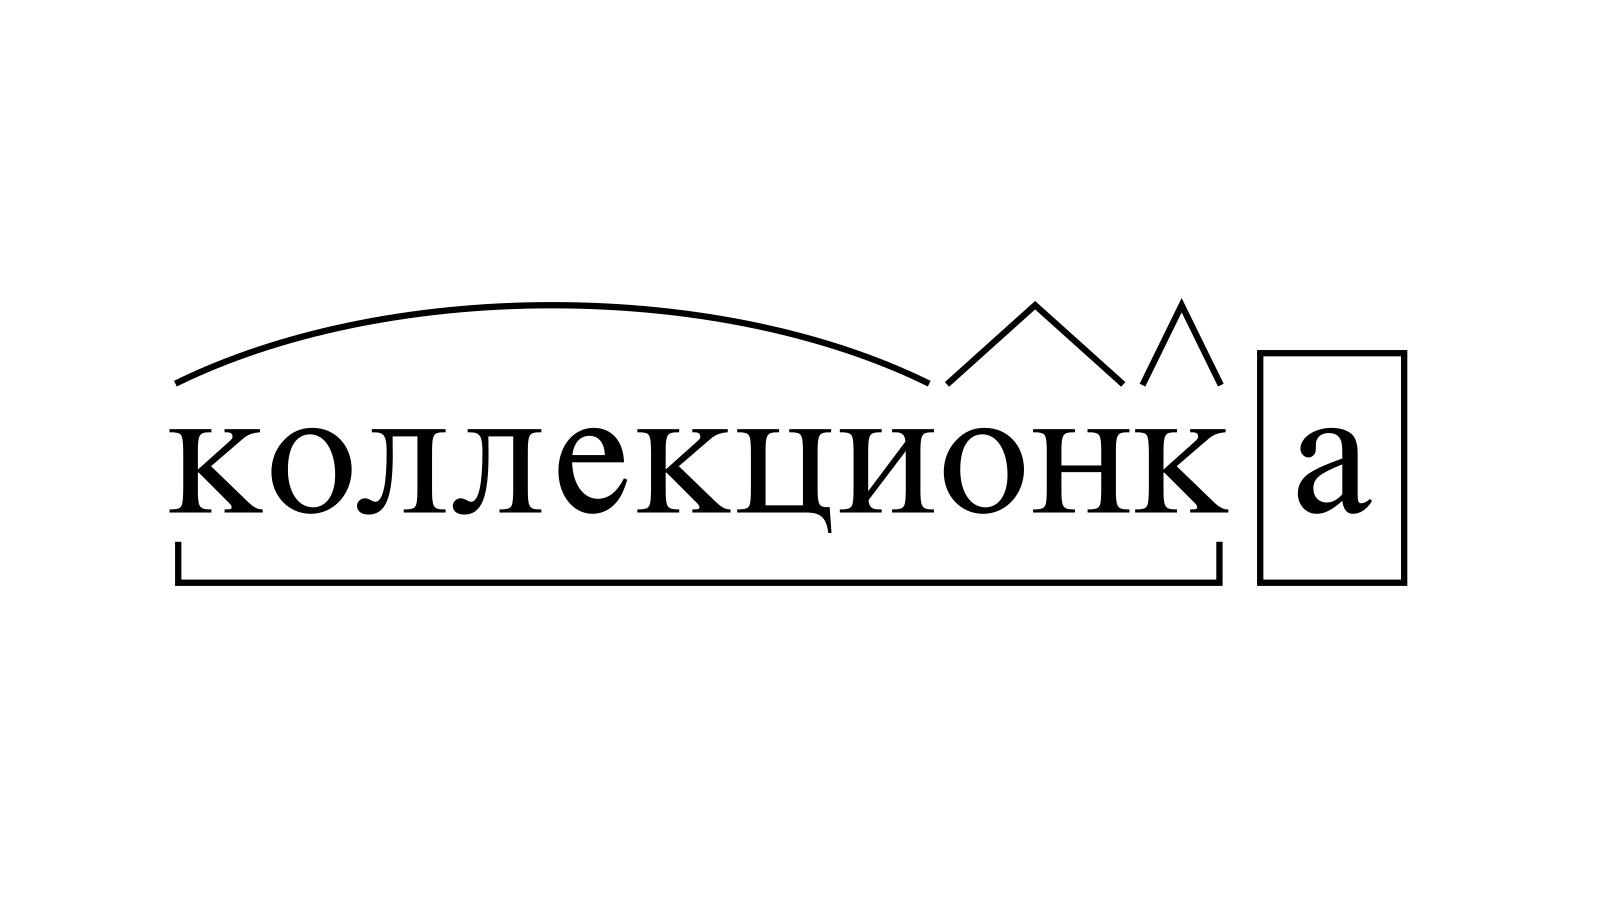 Разбор слова «коллекционка» по составу